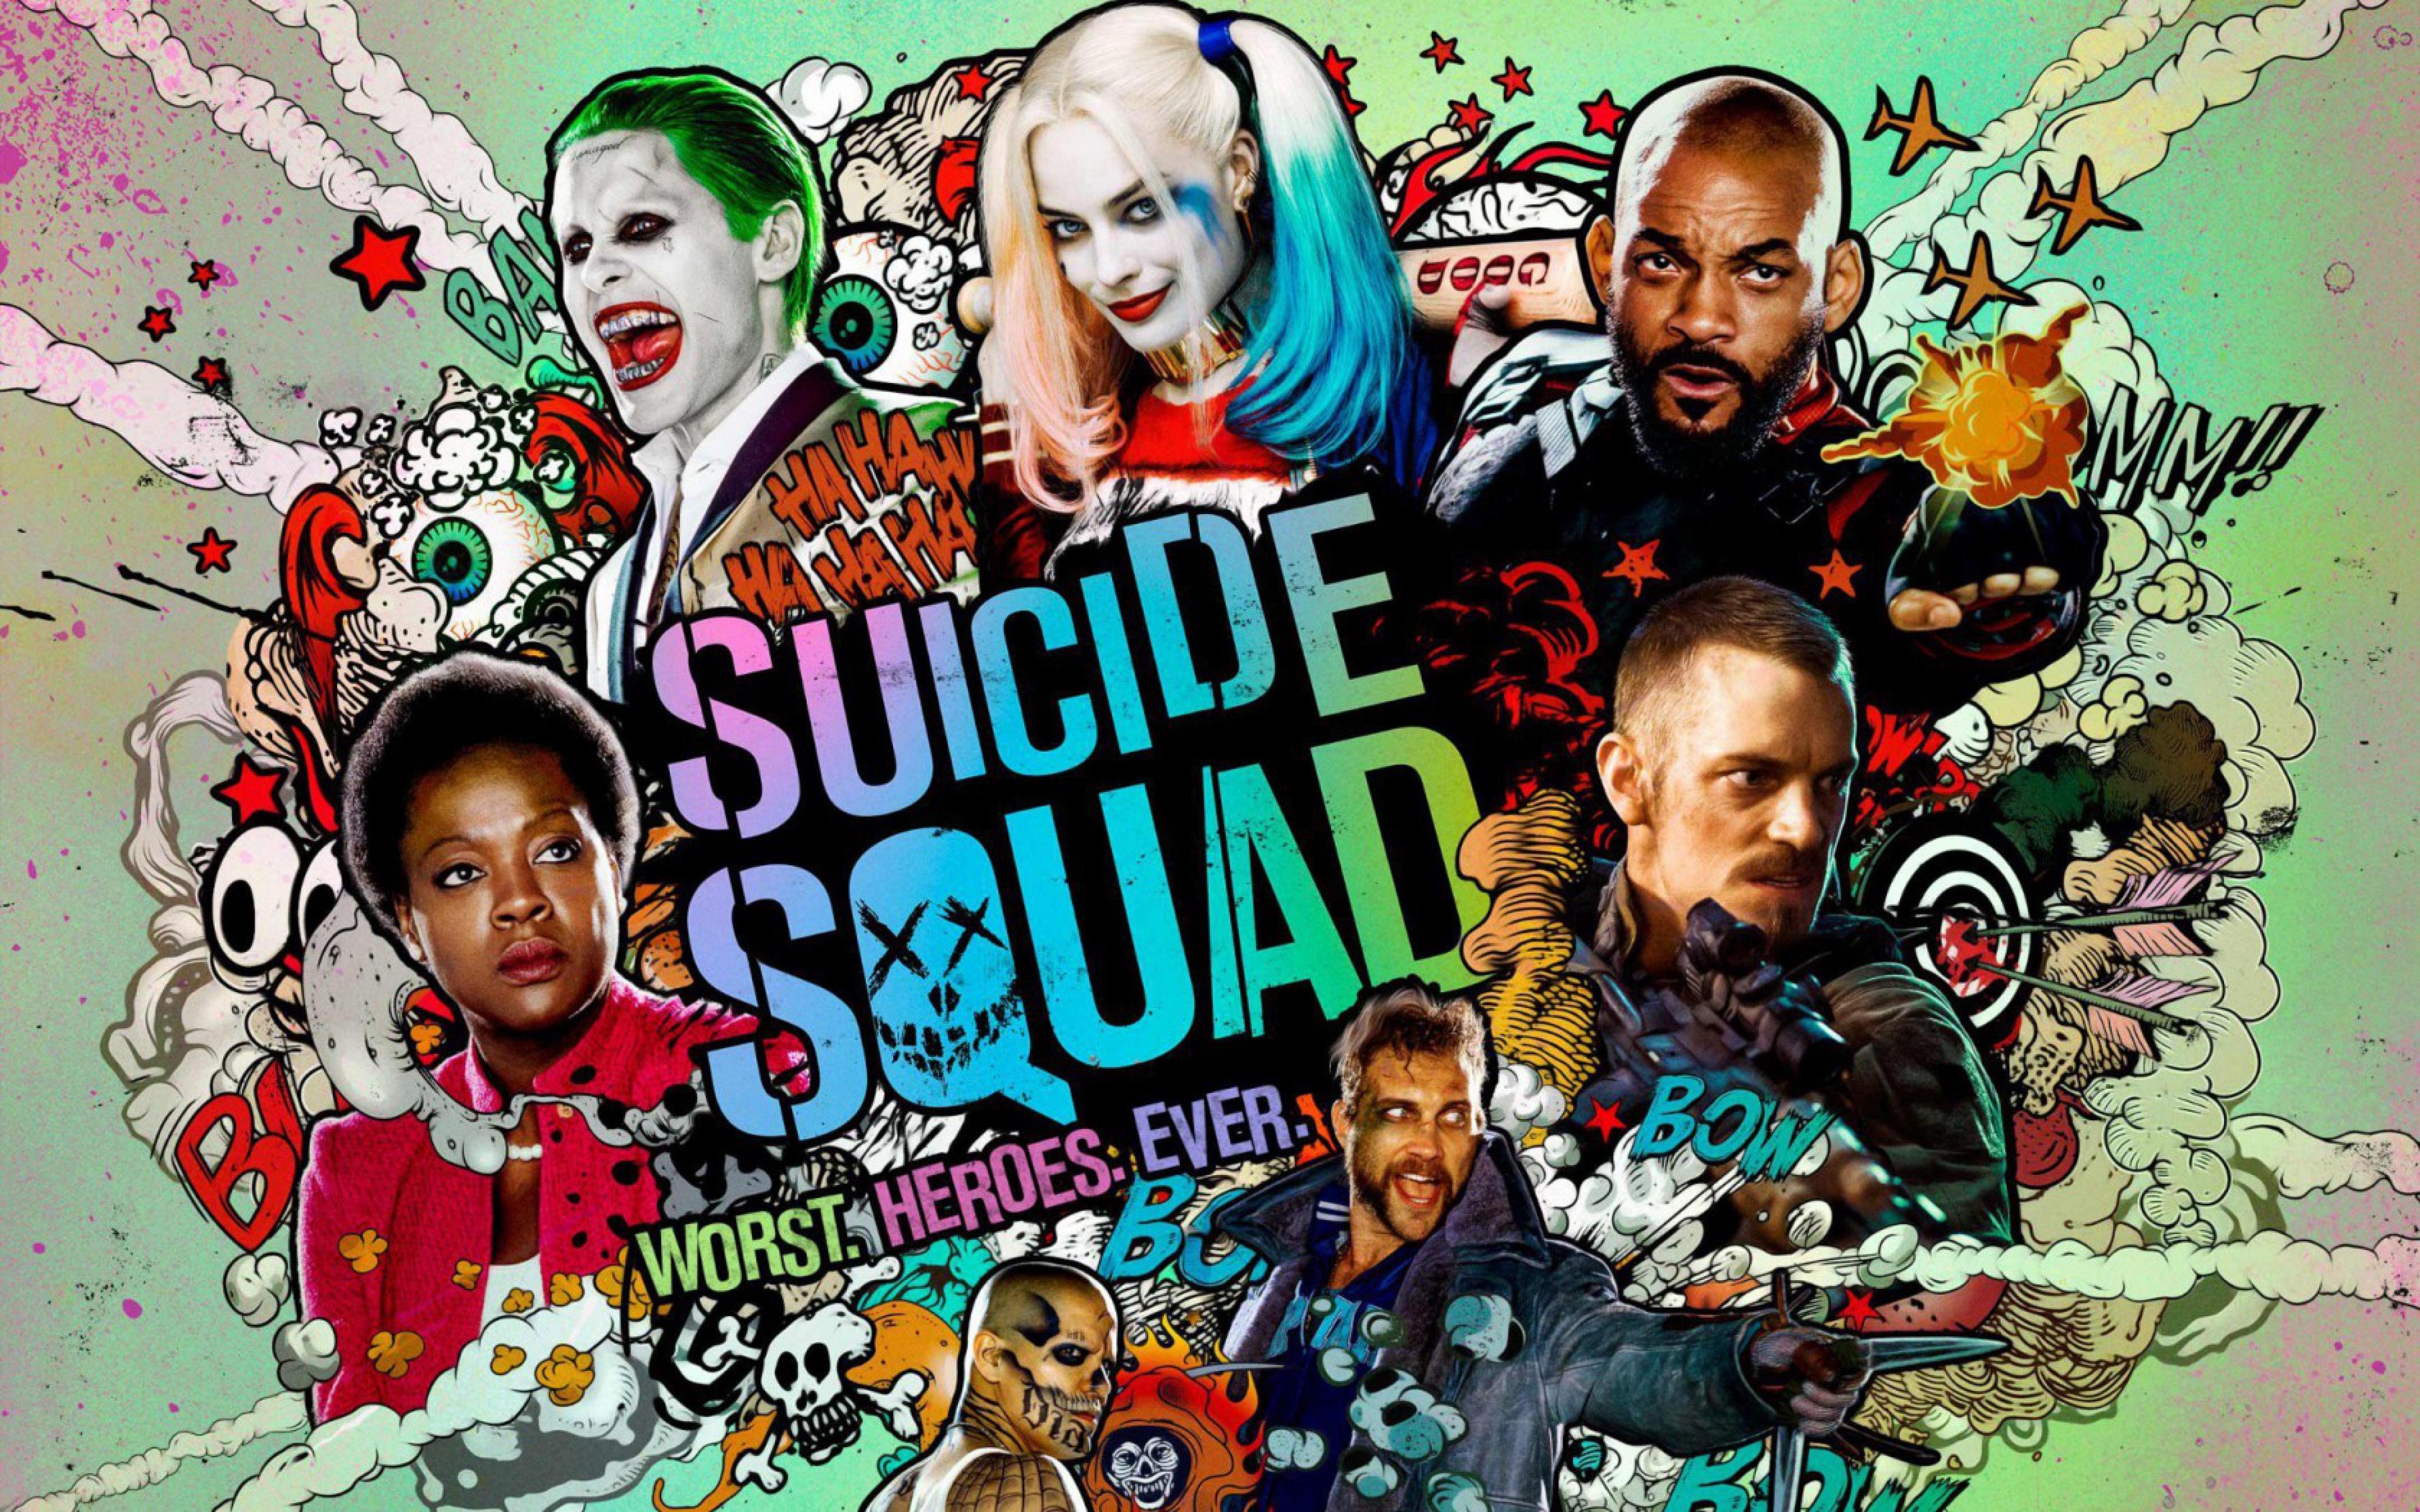 Suicide Squad wallpaper 15 3840x2400